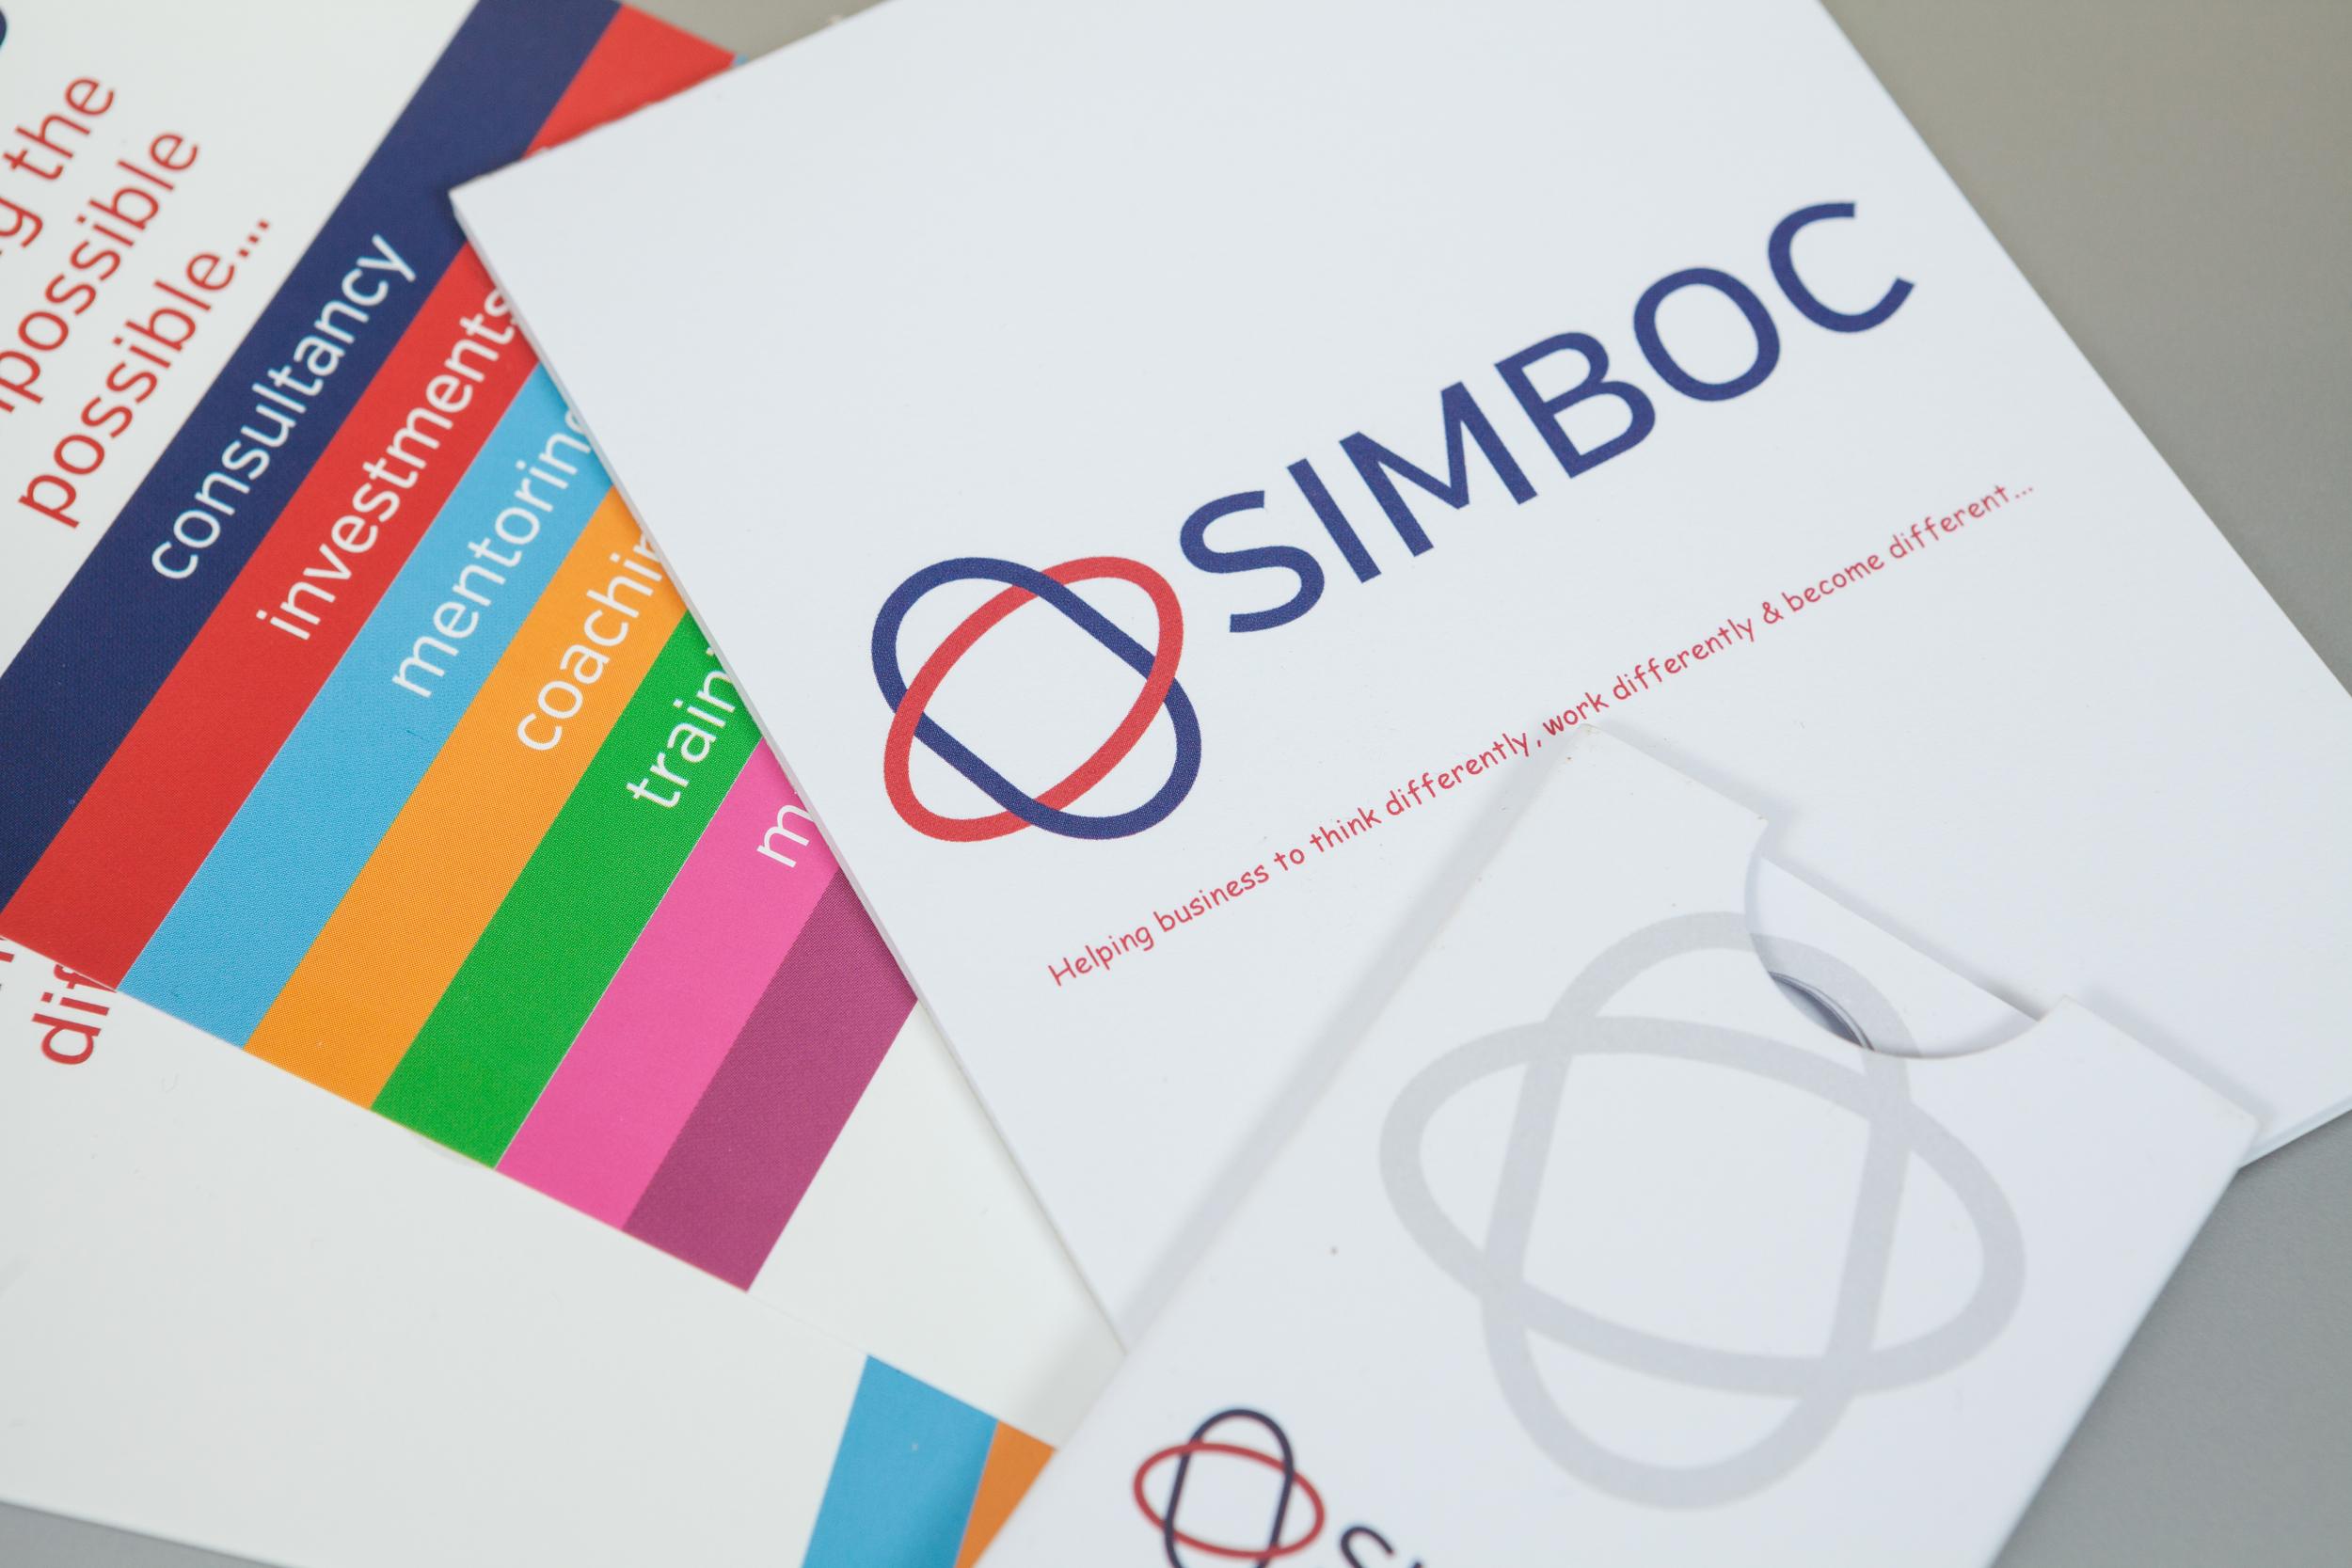 Simboc Leaflets- Close up _SimbocLtd_6935.jpg